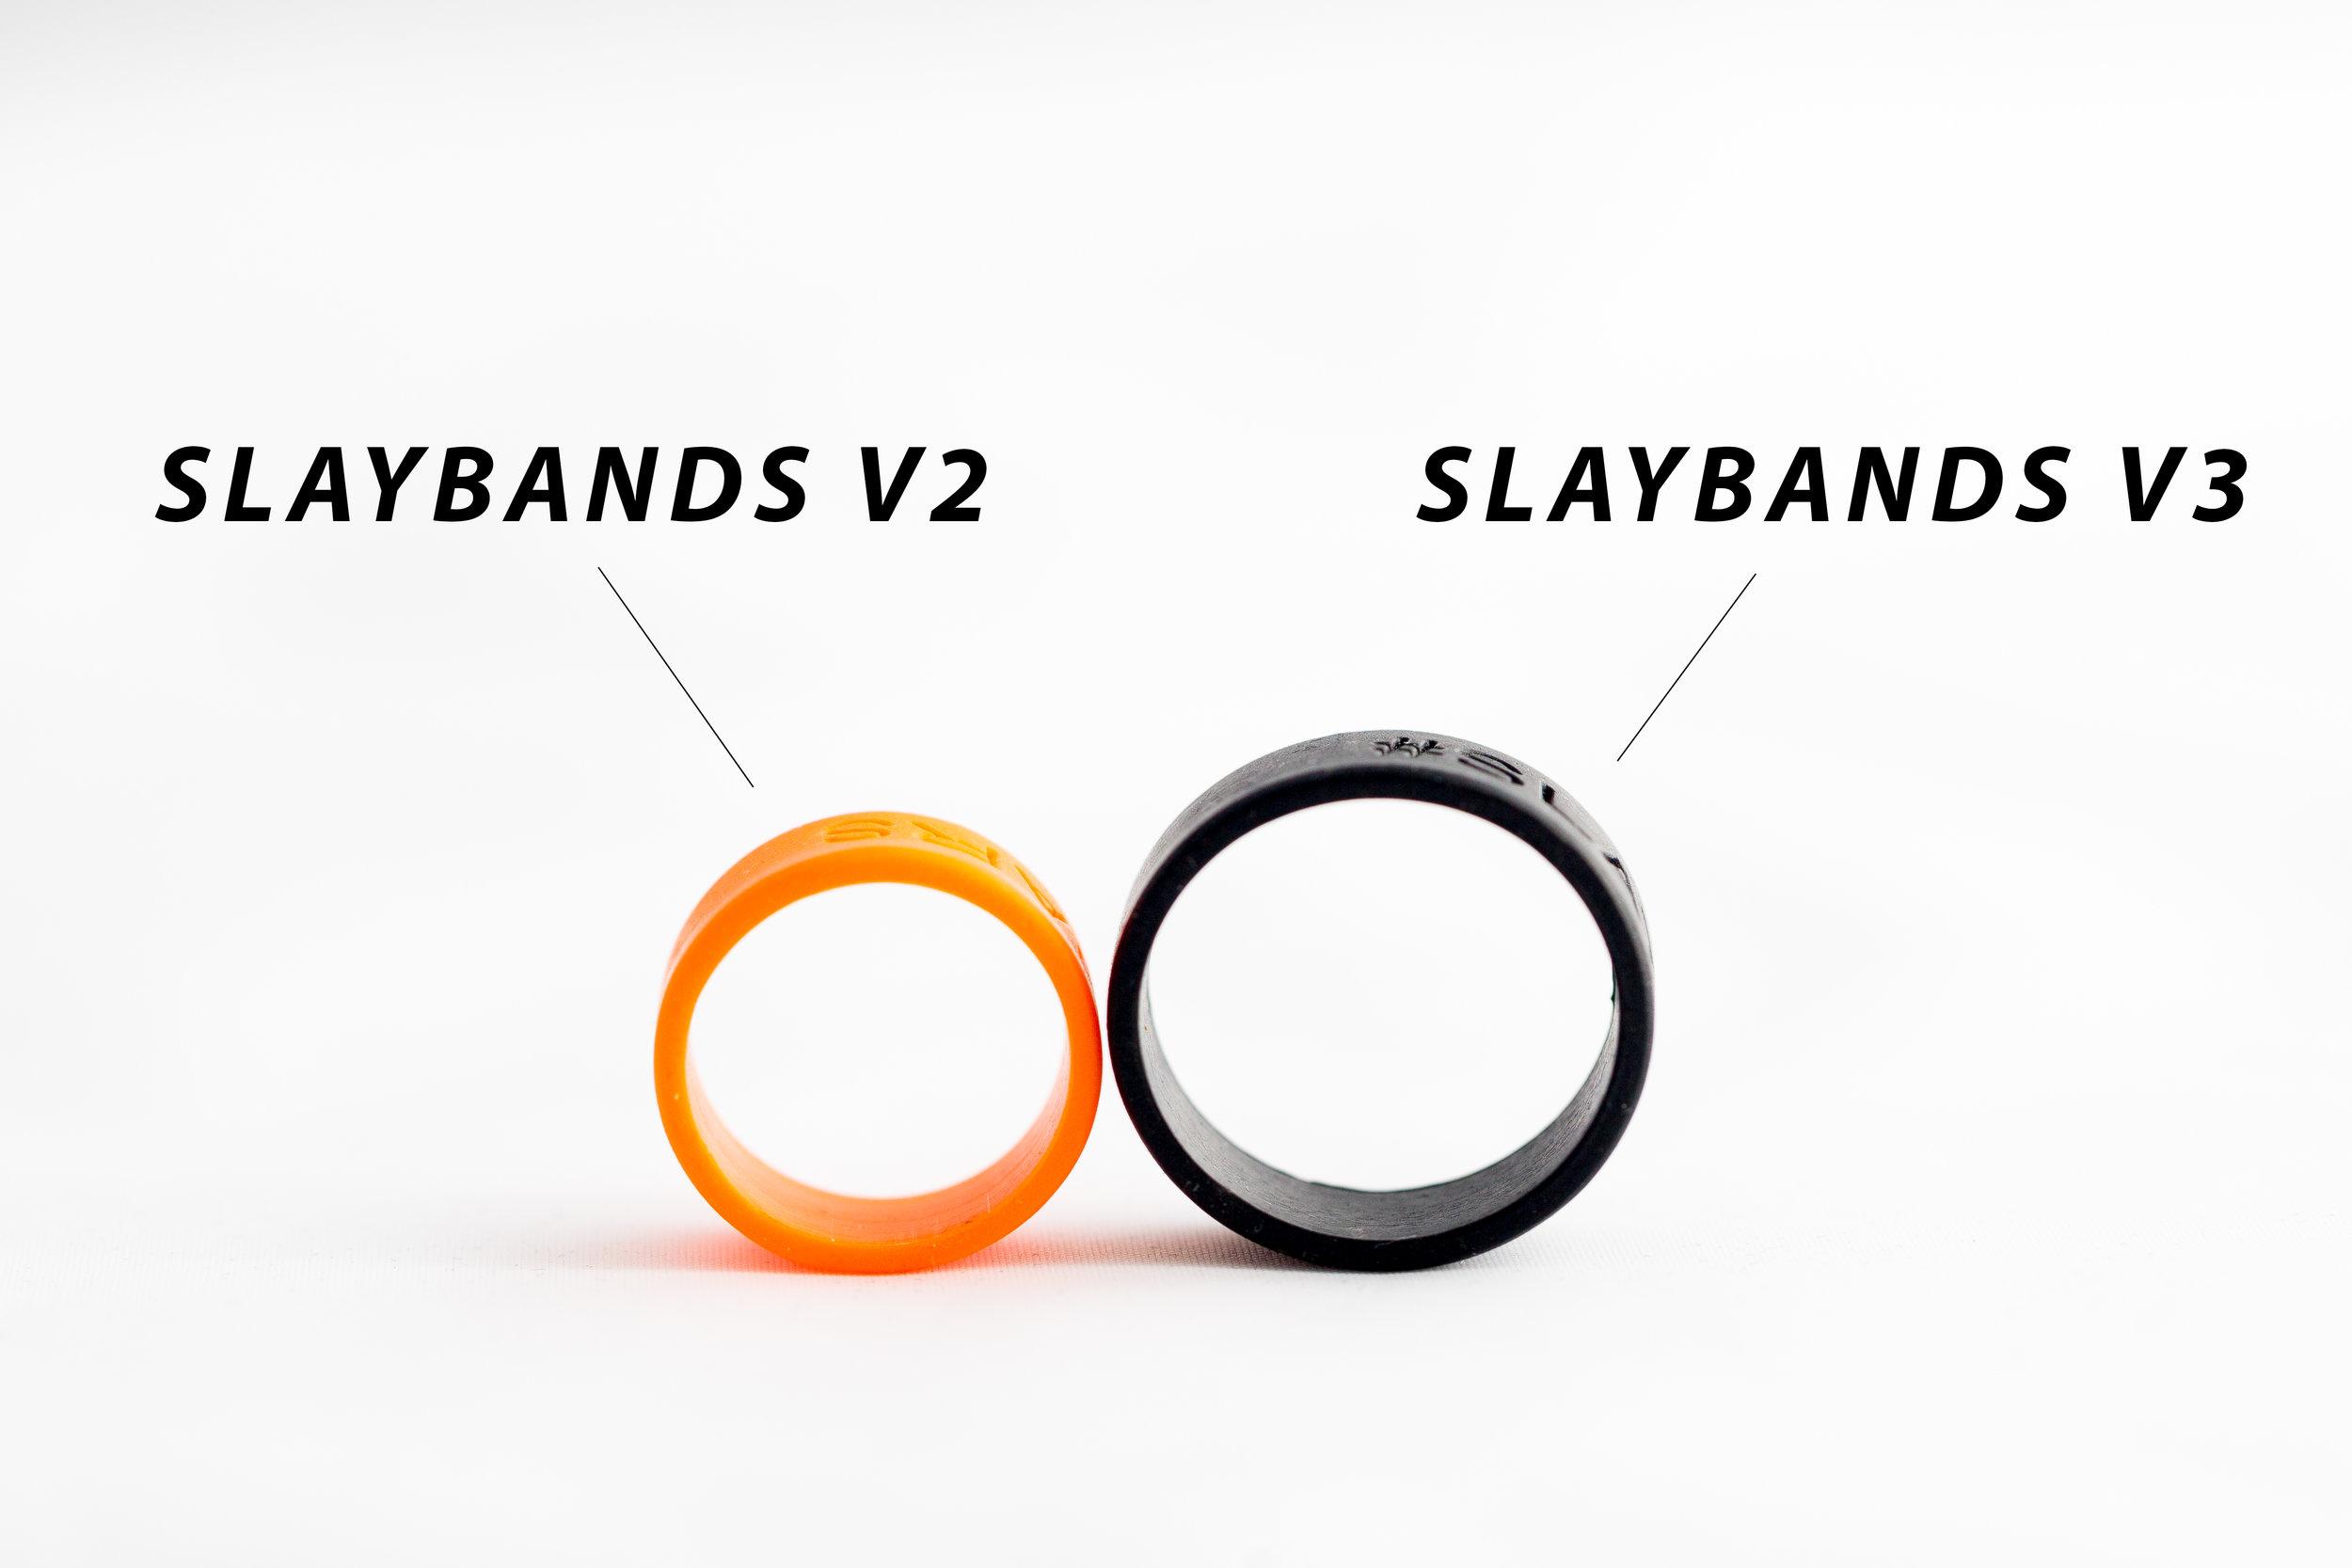 slaybands-v3-vs-v2-comparison-size-2.jpg